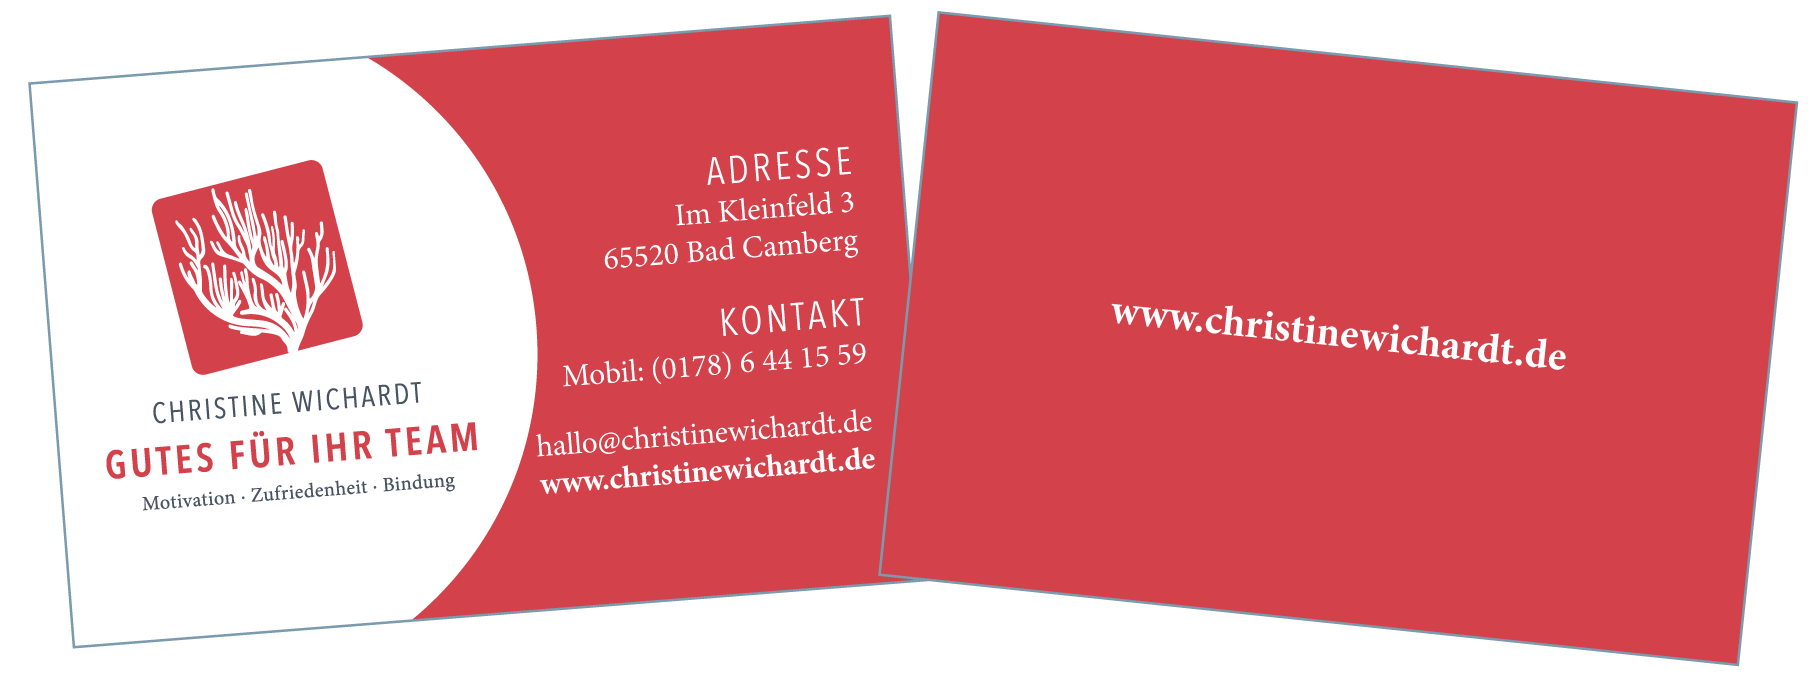 christinewichardt.de